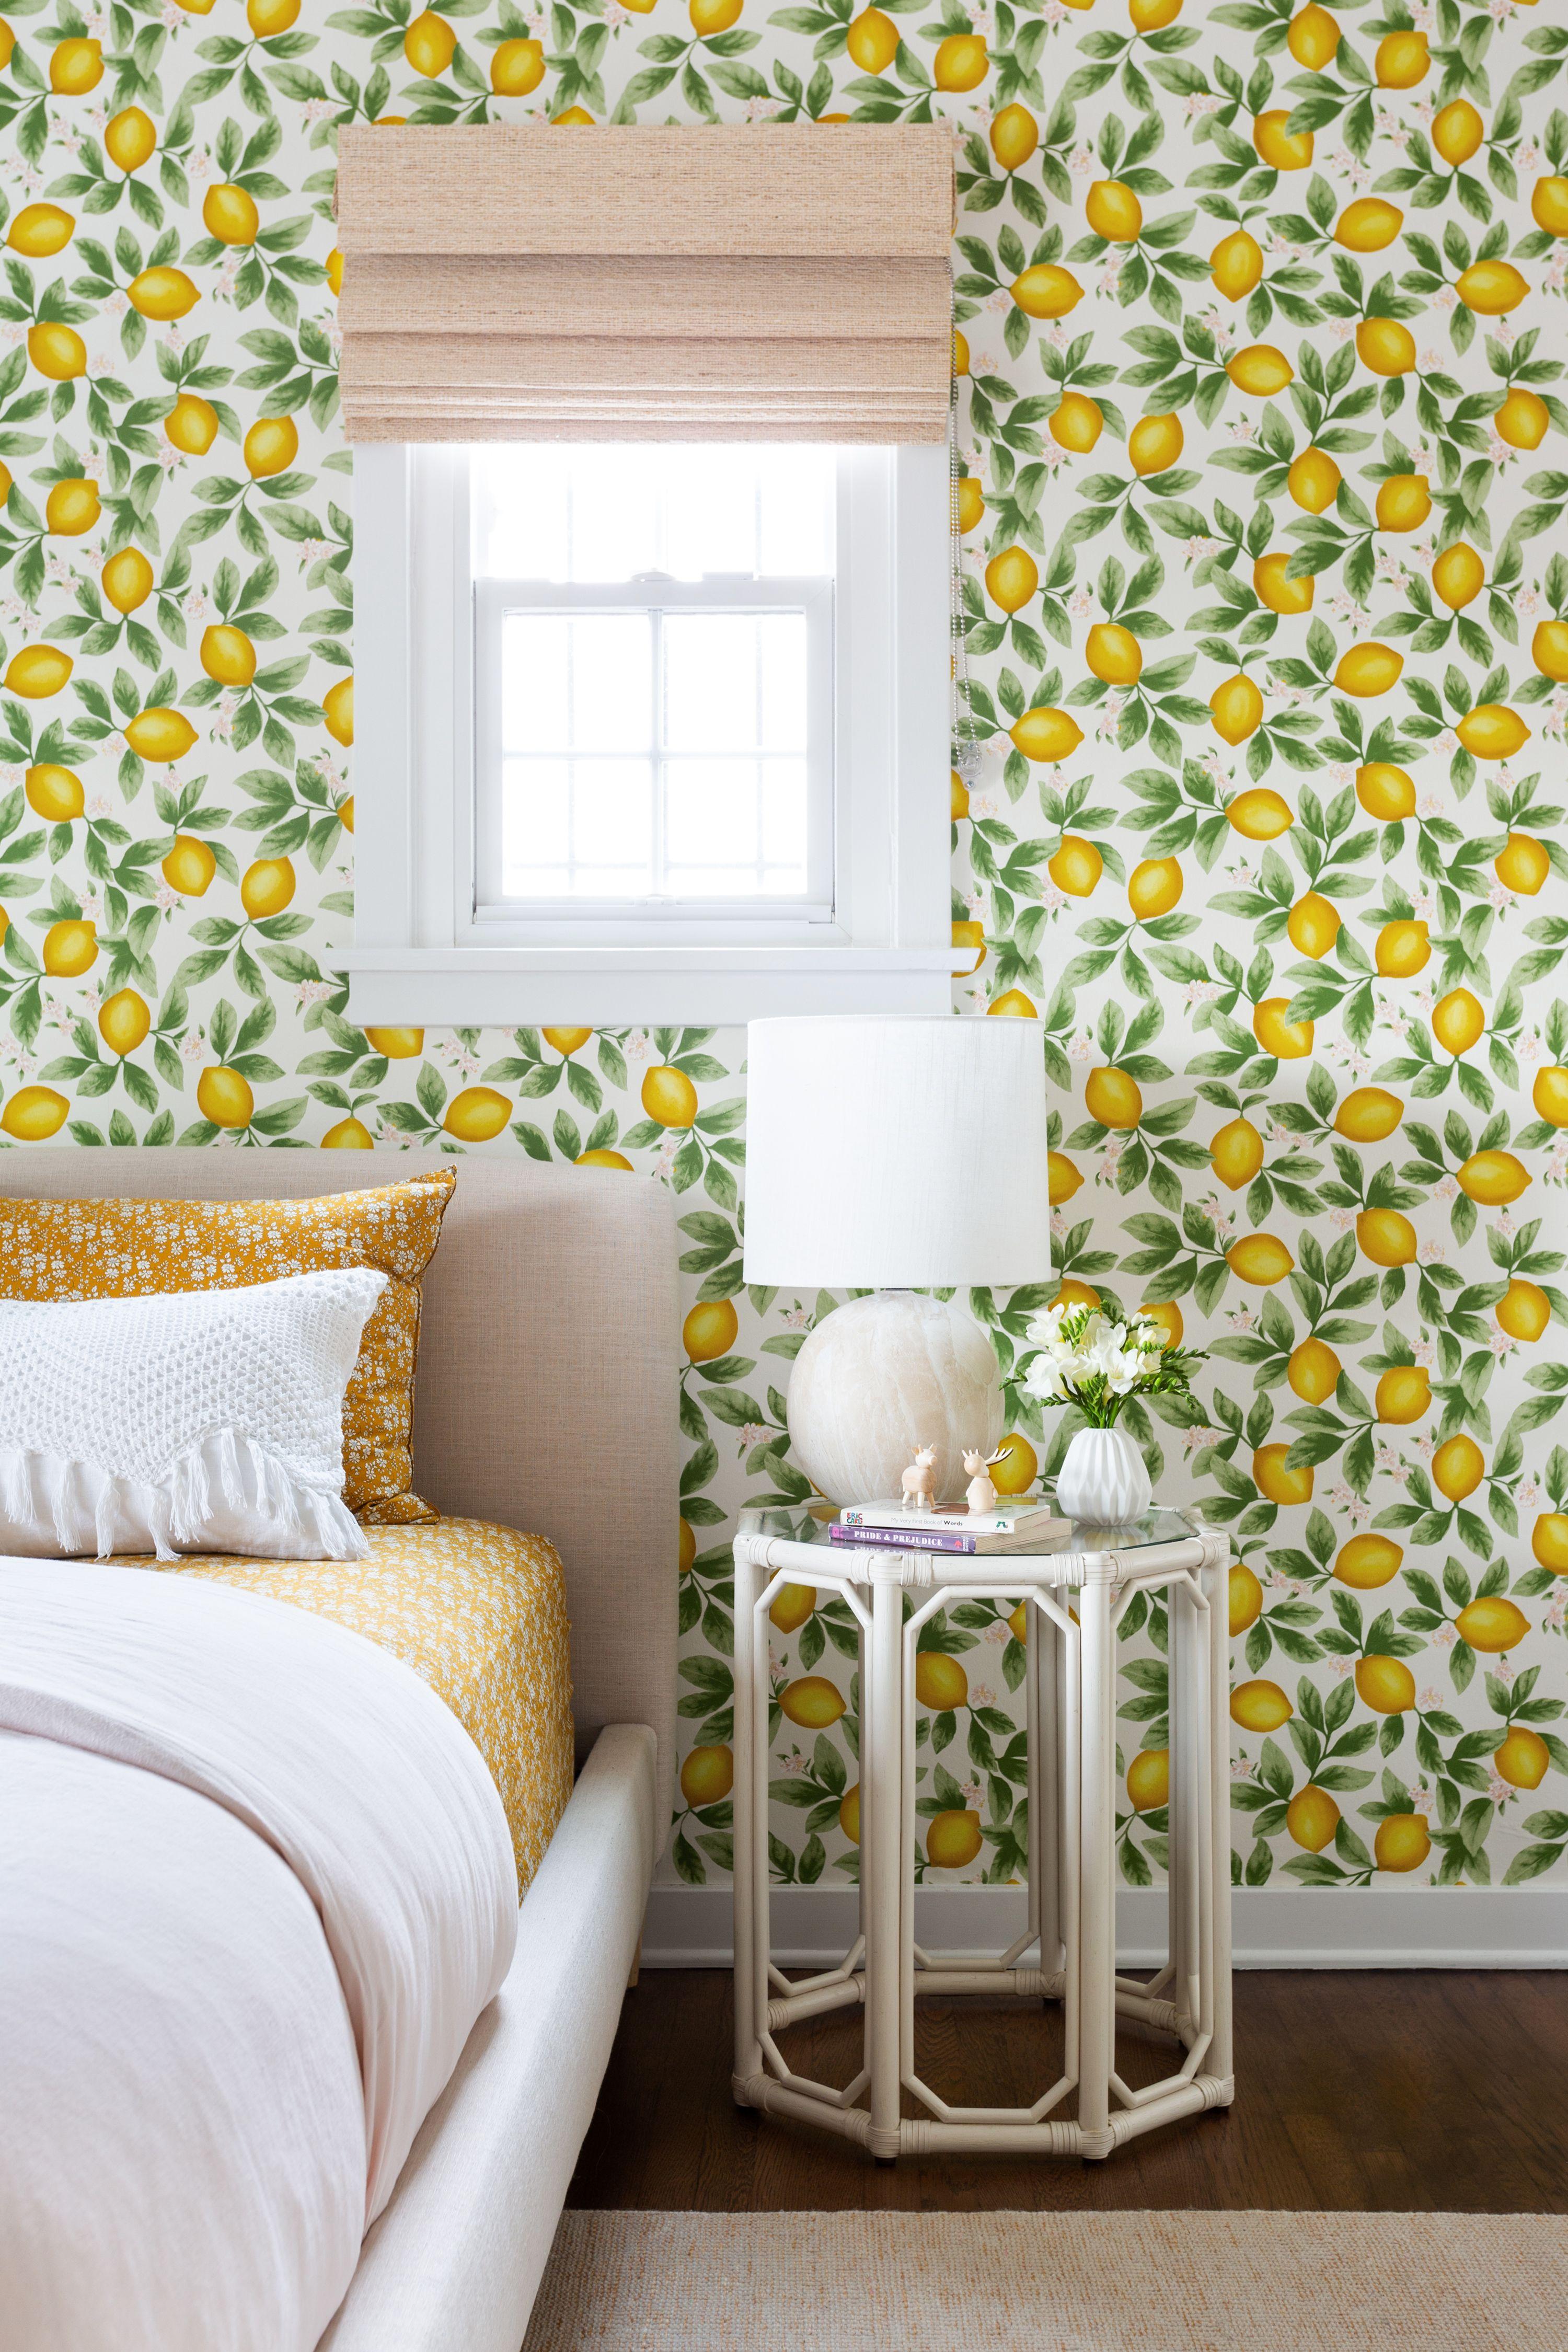 7 Citrus Wallpaper Ideas That Scream Summertime Home